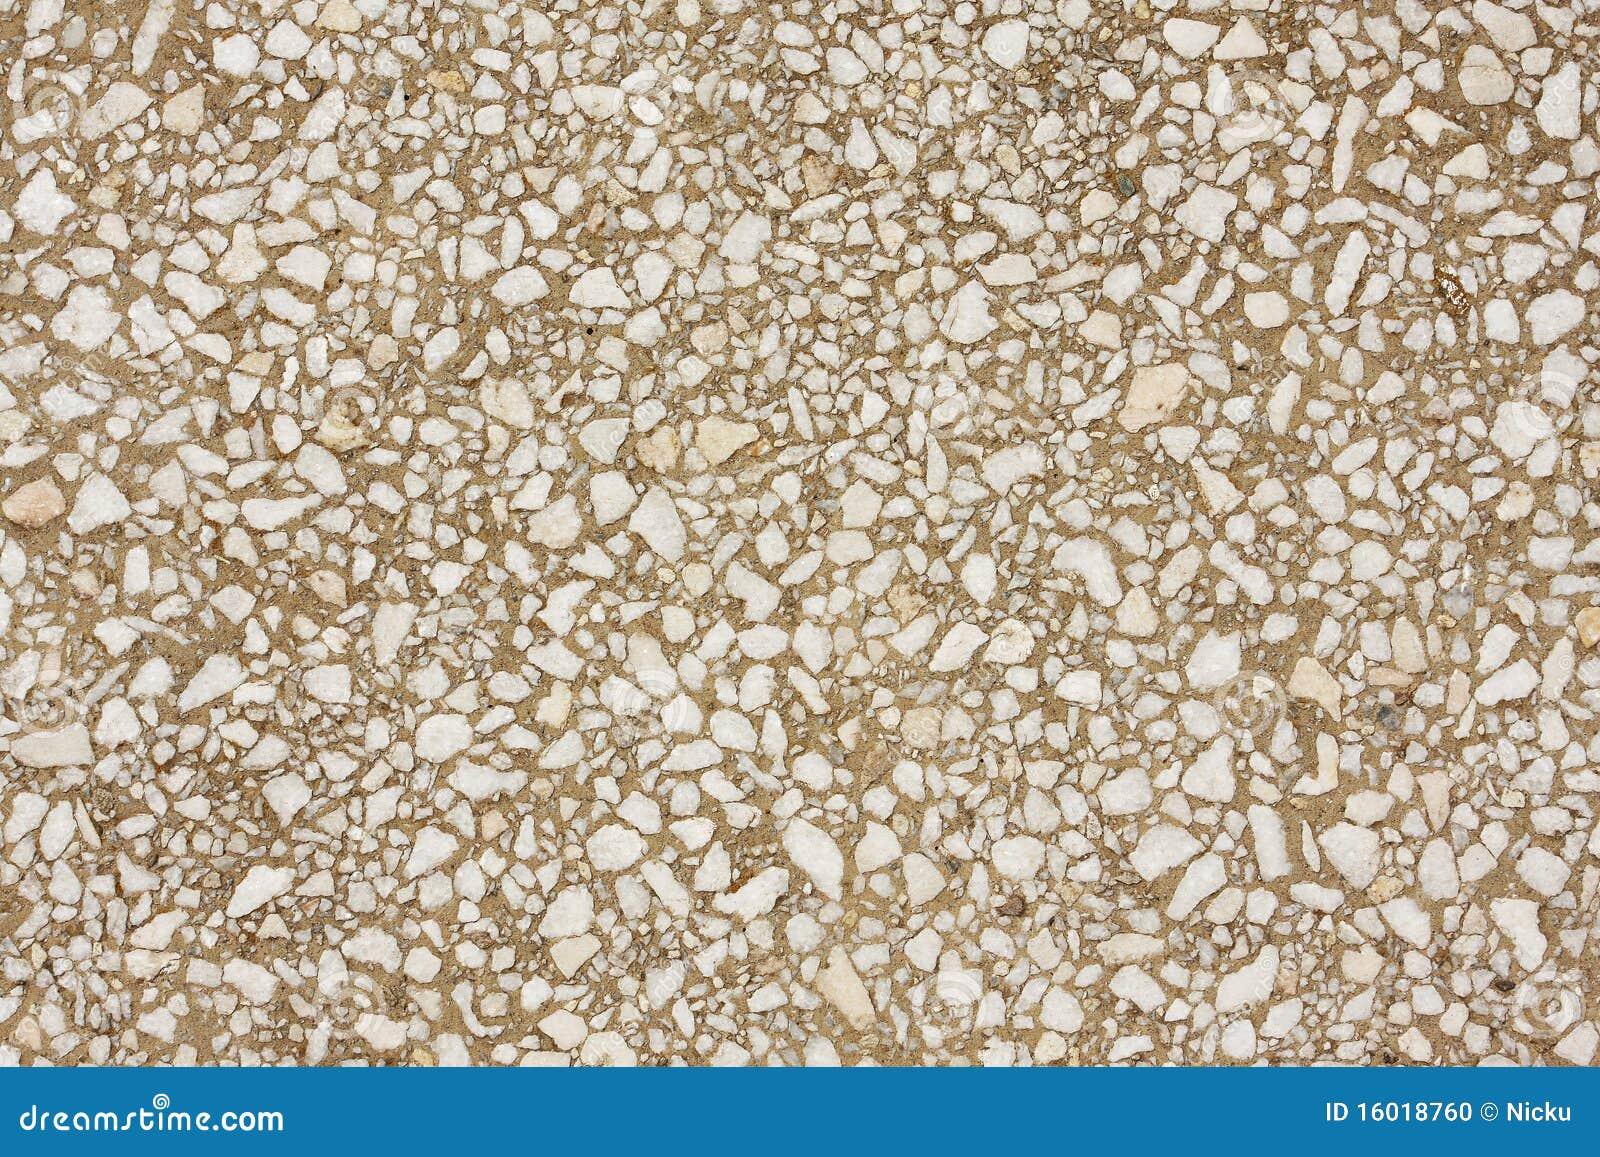 Marble Pebbles Texture Stock Photo Image 16018760